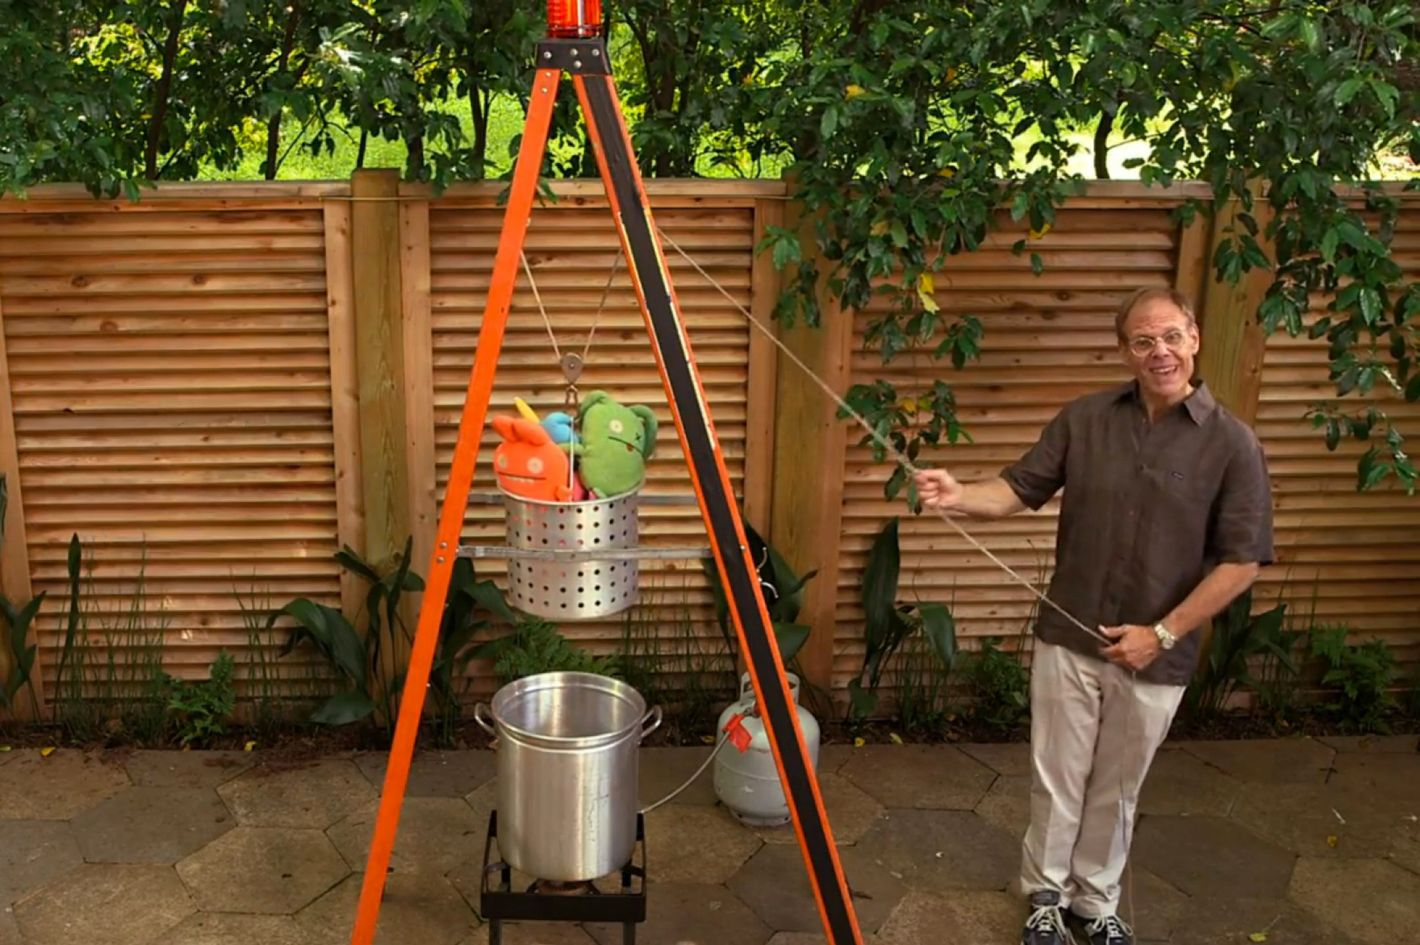 alton brown built the outdoor deep fry rig of your dreams